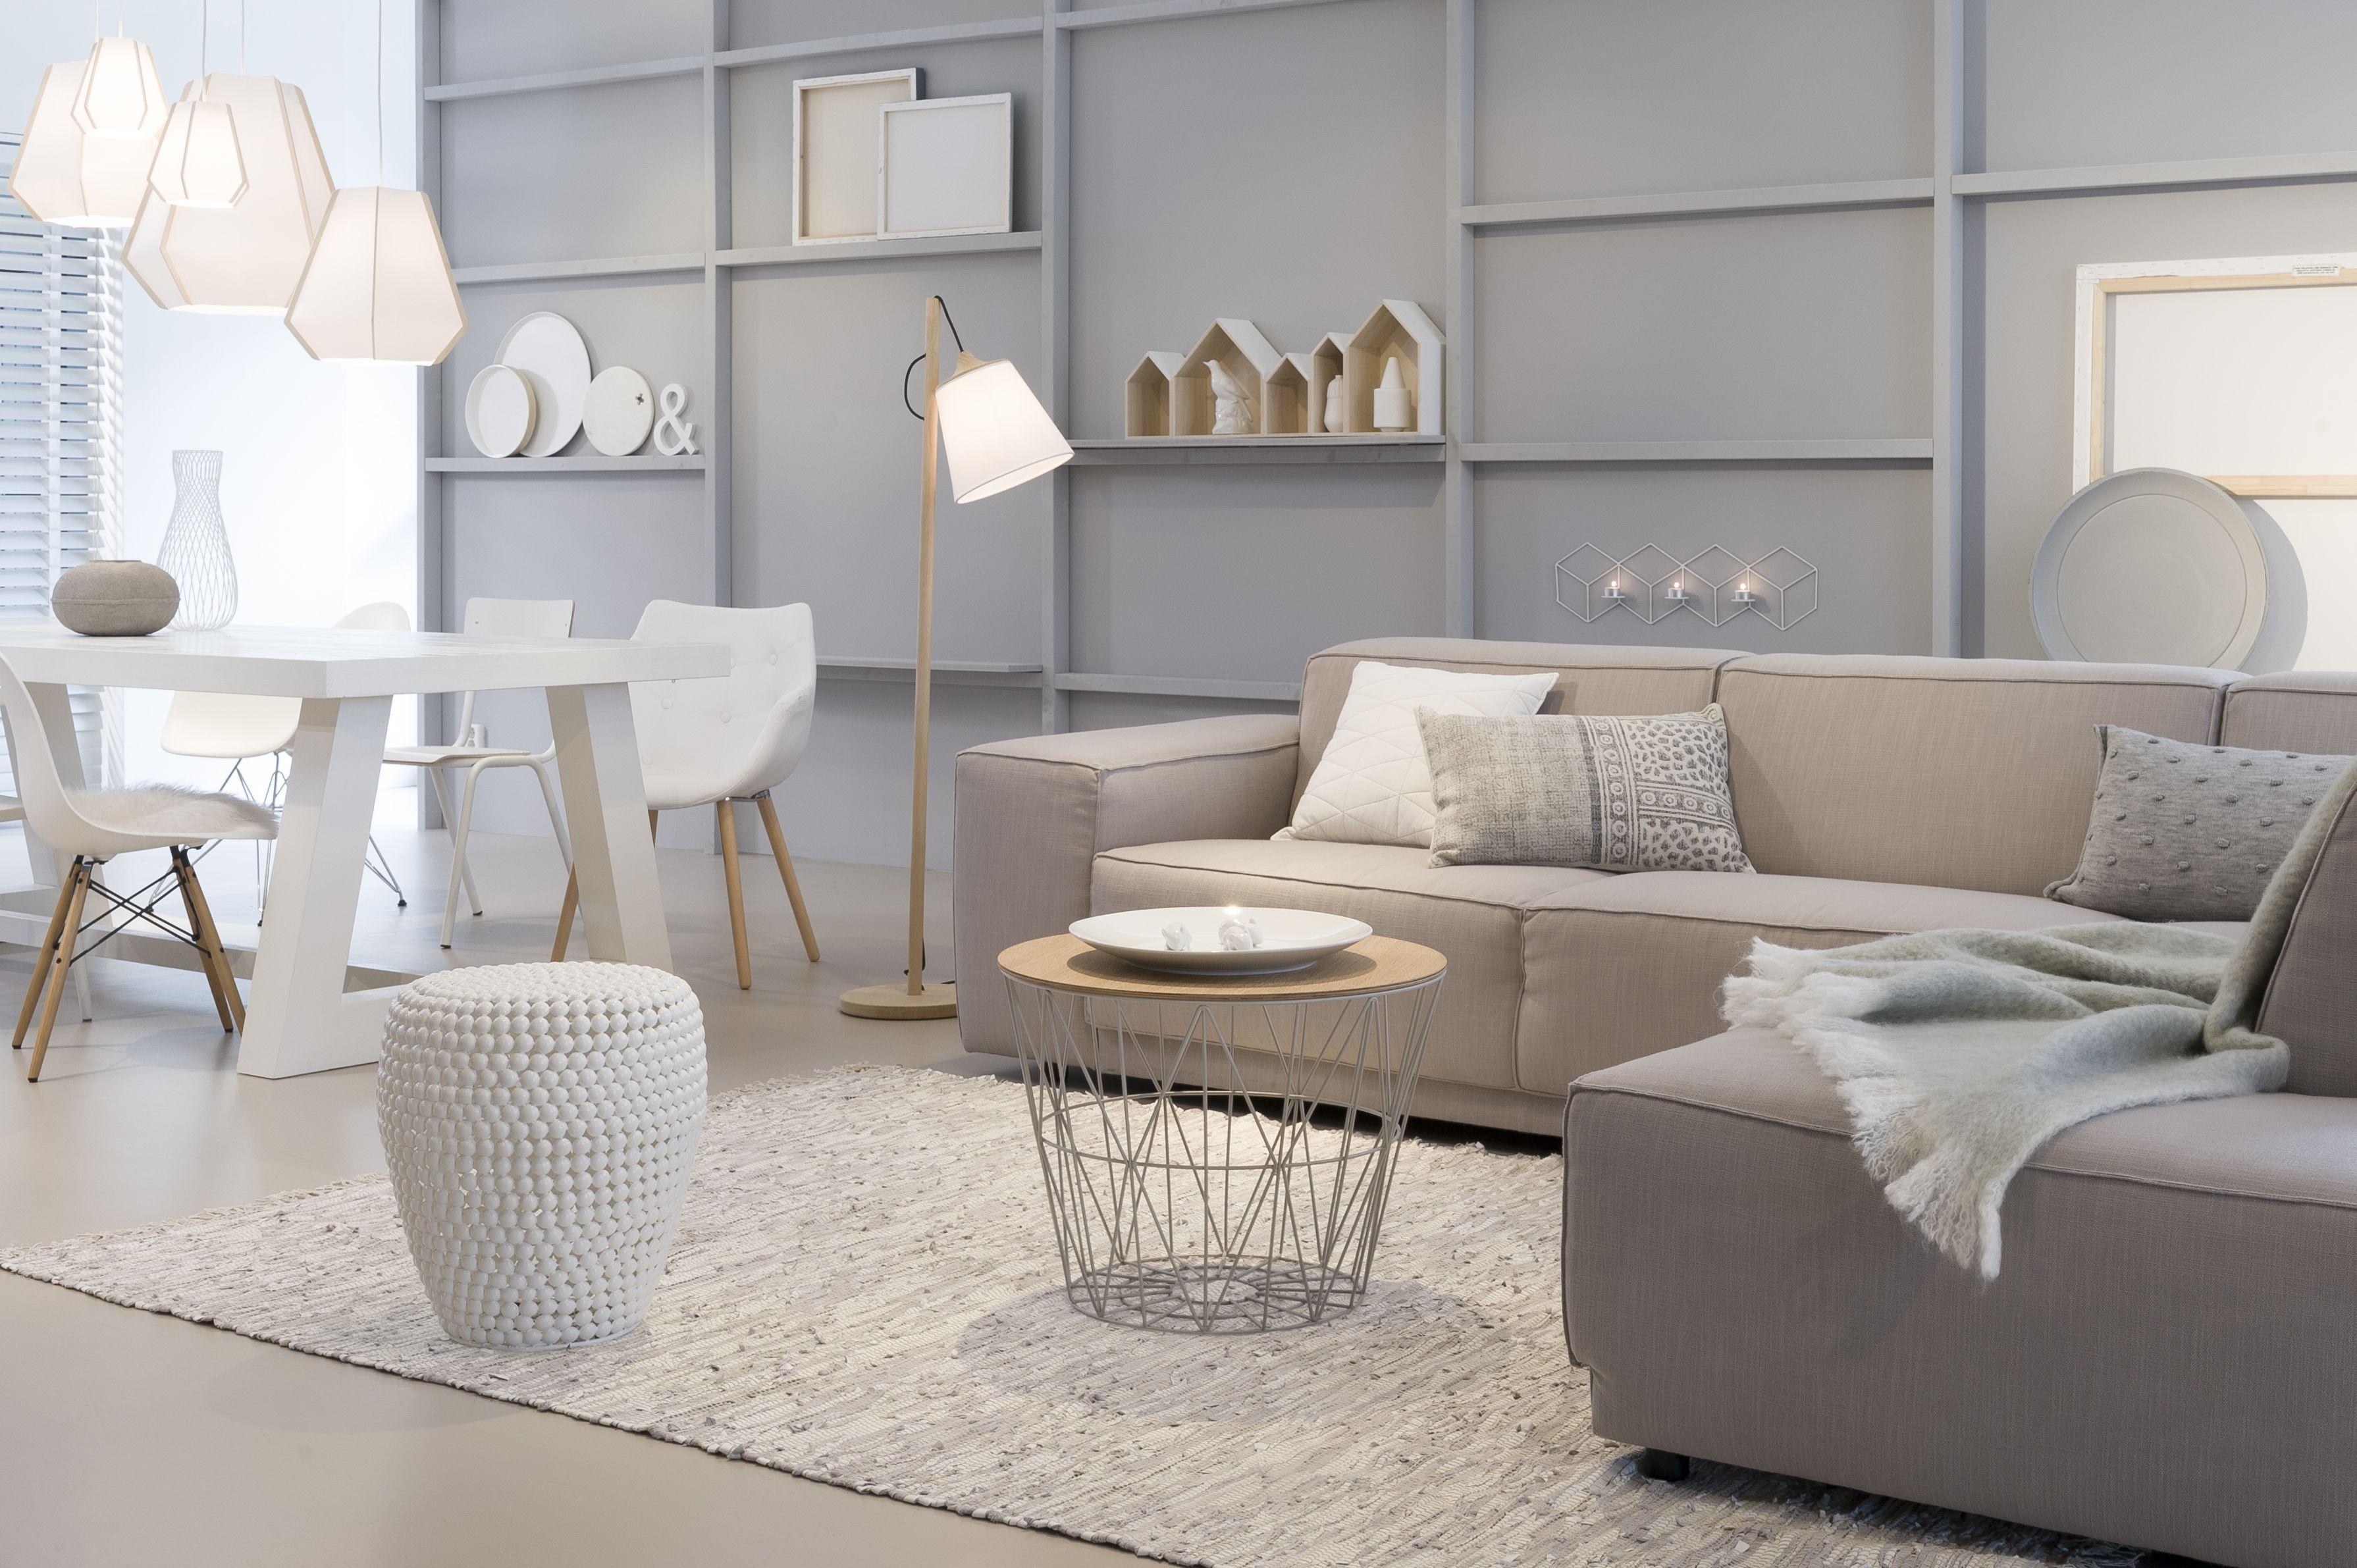 Bright white stijl studio seizoen 3 eijerkamp for Kamer interieur